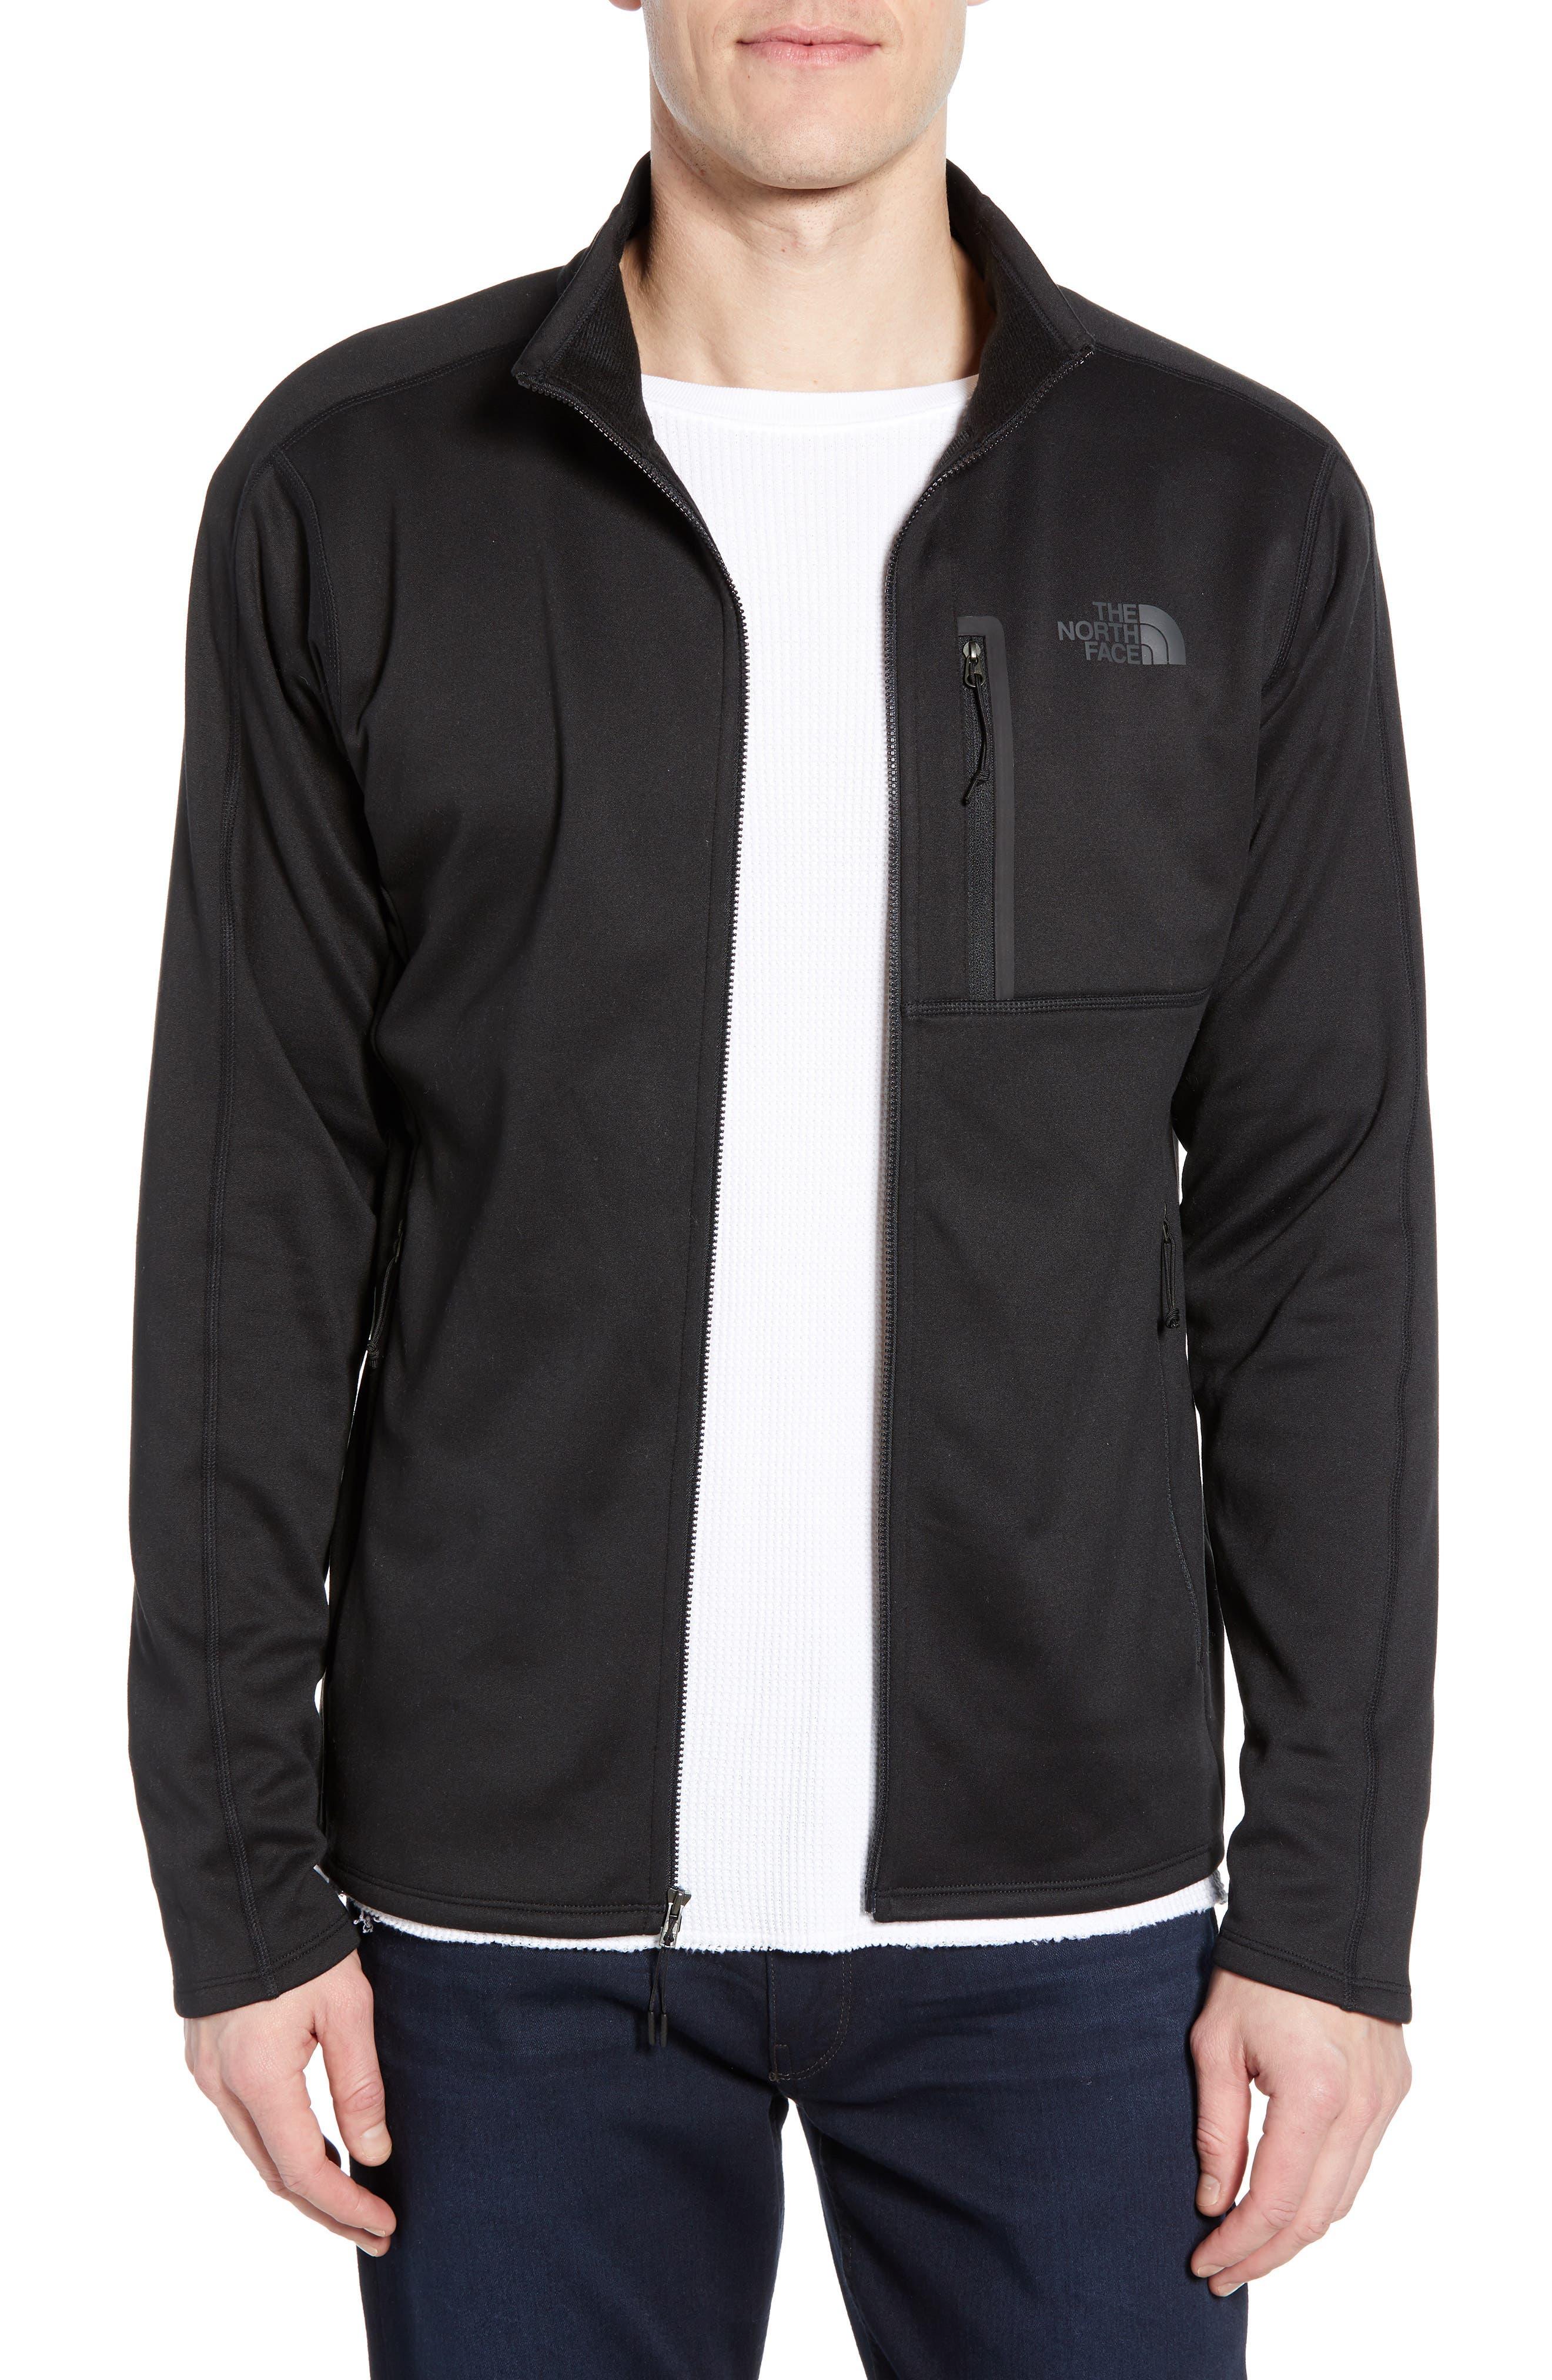 THE NORTH FACE,                             Canyonlands Zip Jacket,                             Main thumbnail 1, color,                             TNF BLACK